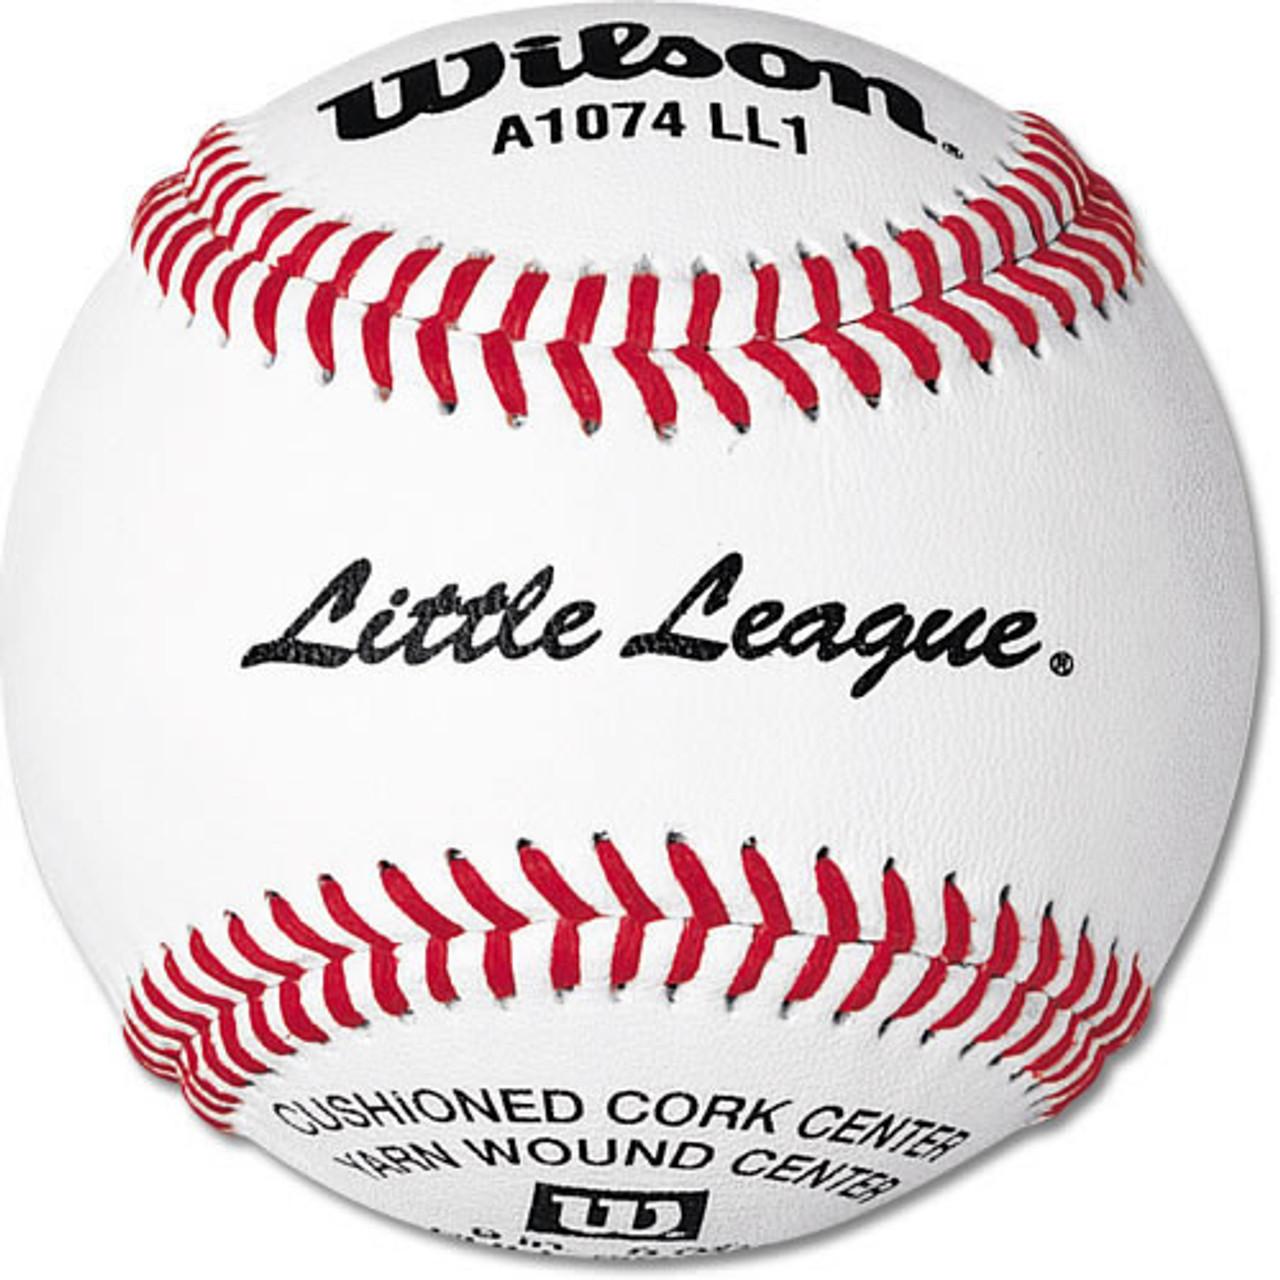 Wilson A1074BLL1 Baseball - C Grade Cover